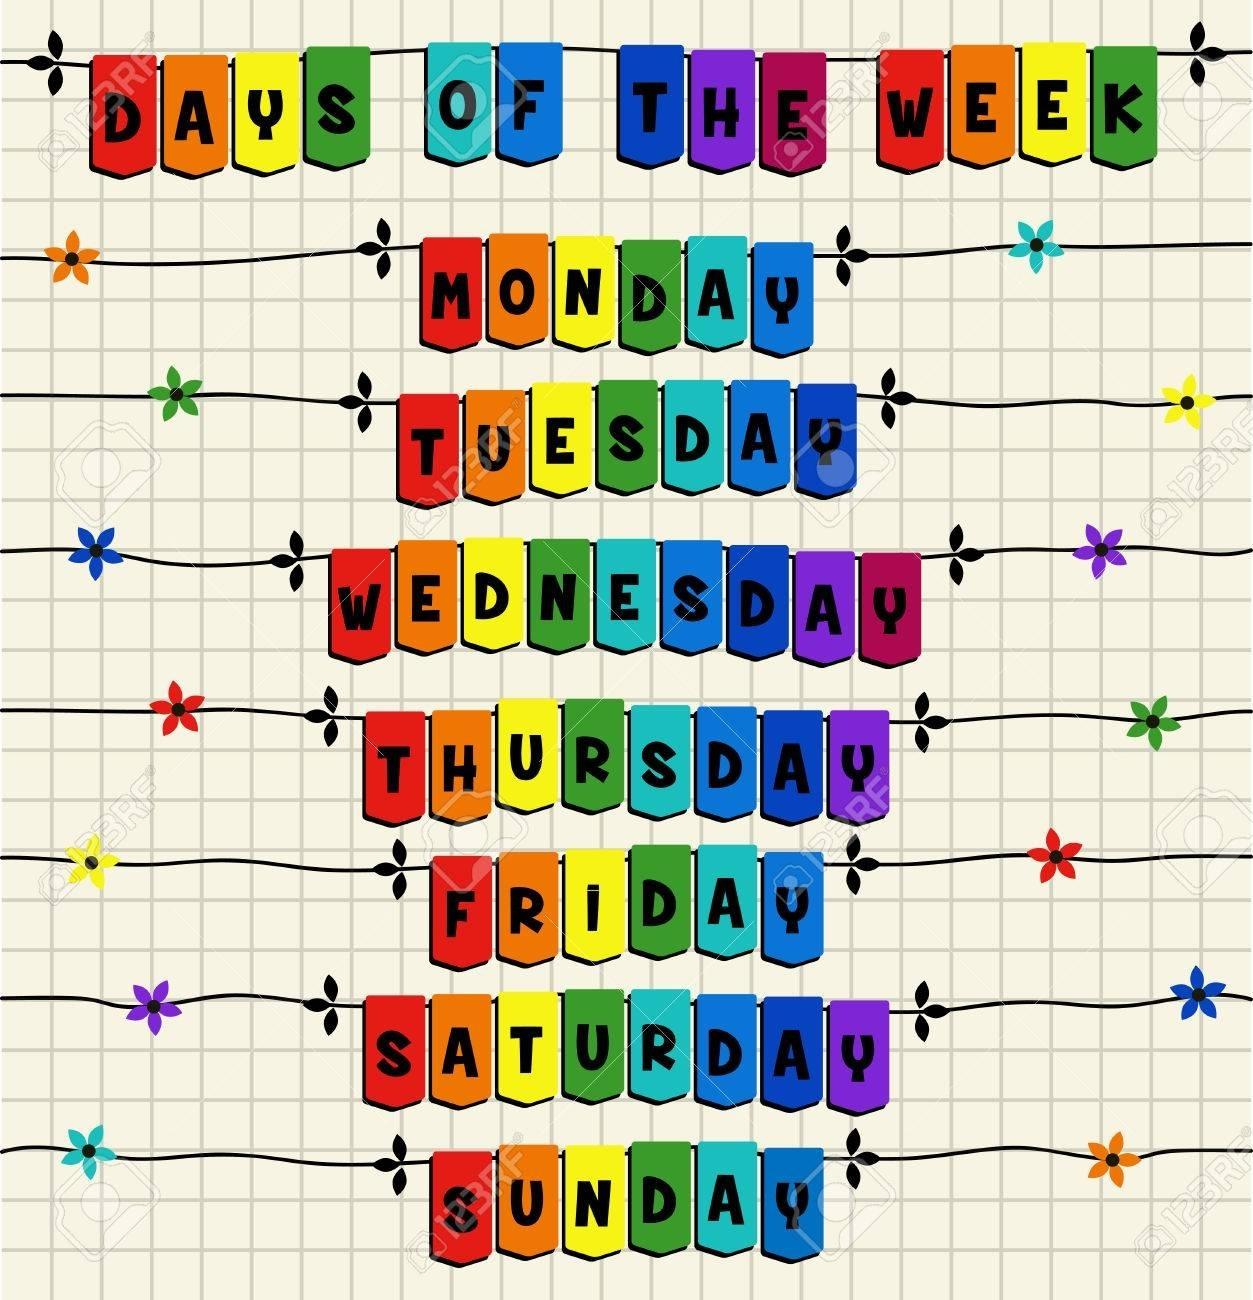 Days Of The Week - Cartoon Template